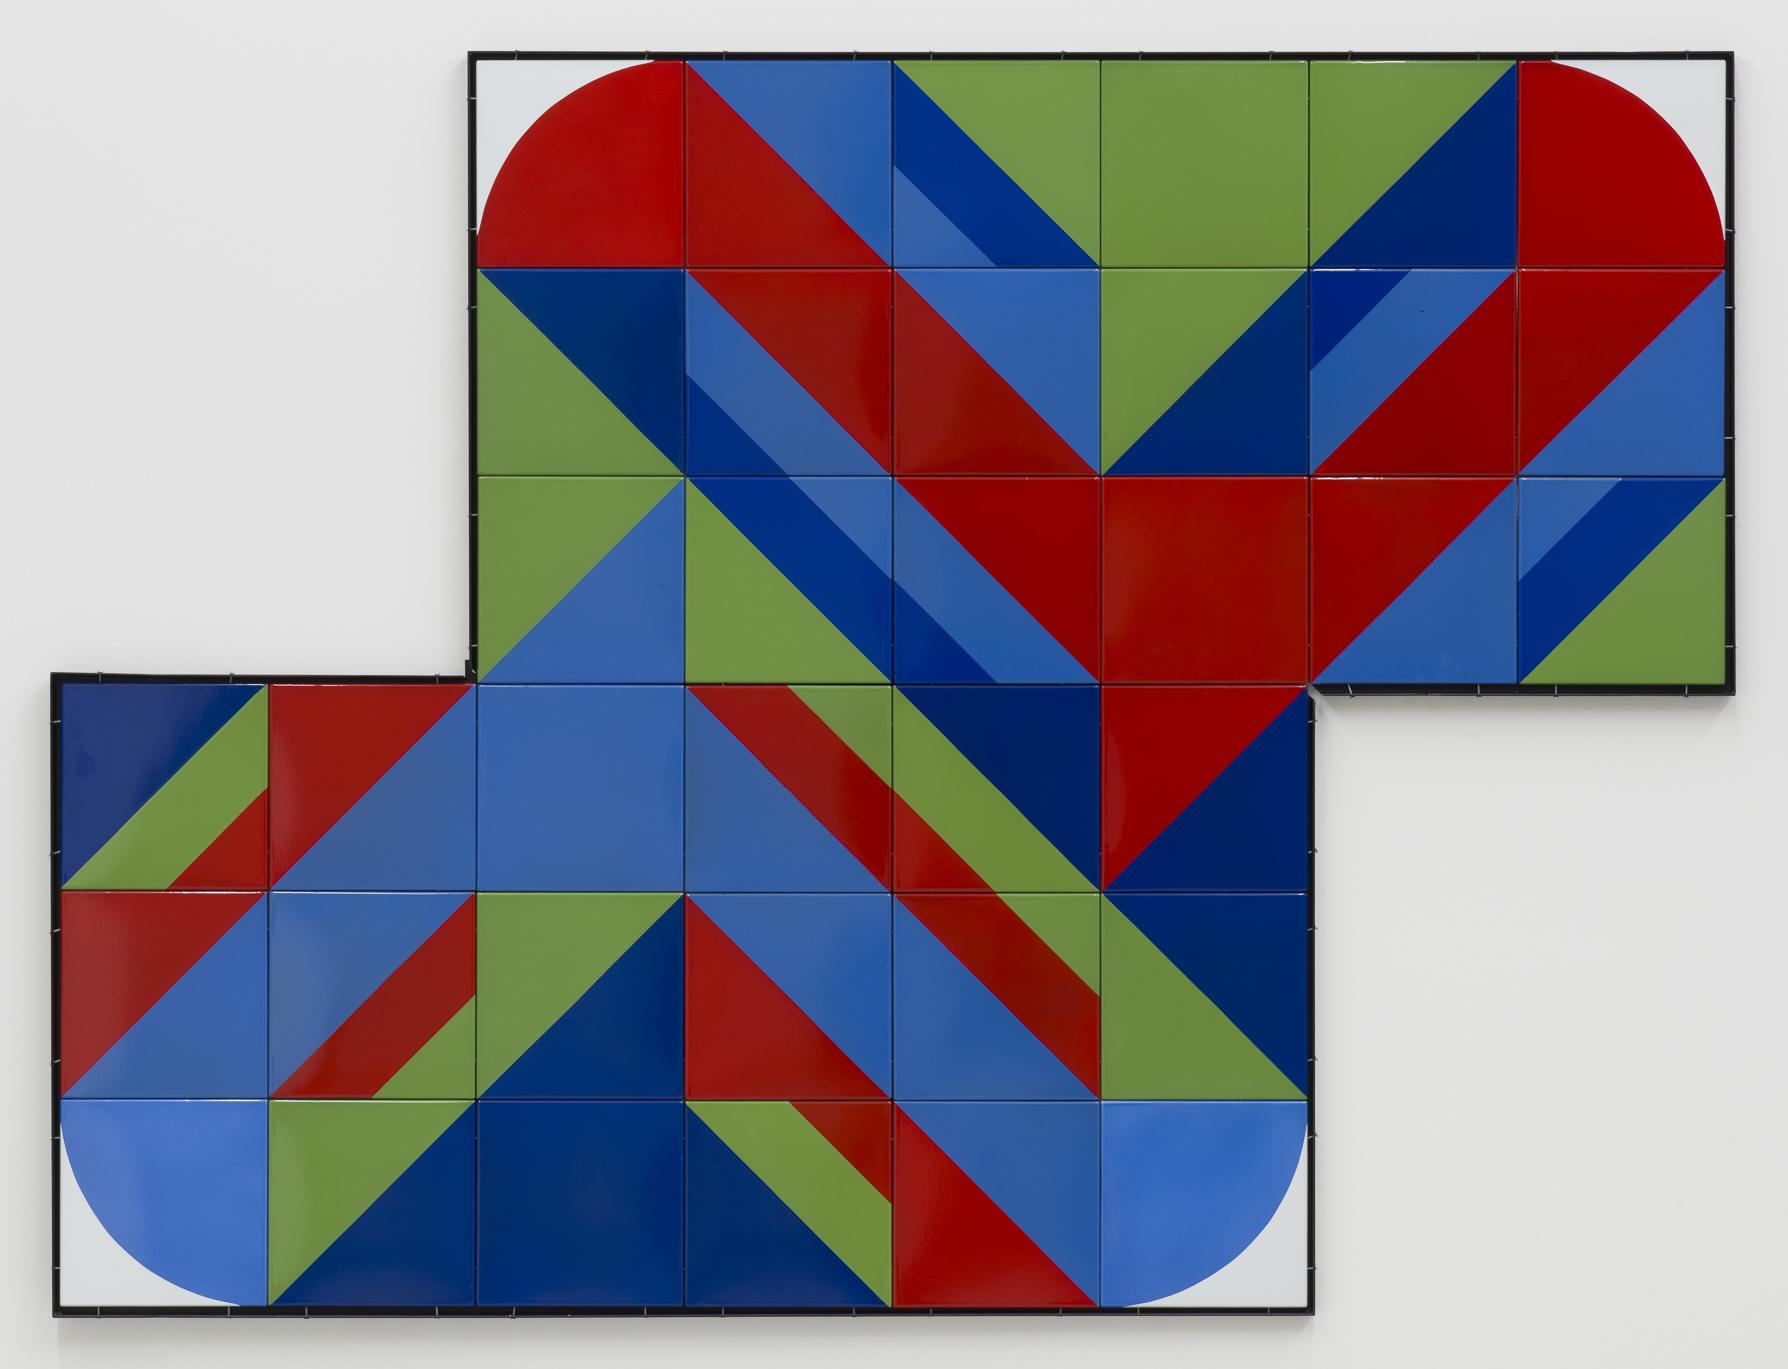 Ferenc Ficzek, Untitled, 1972, series of 36 enamelled steel plates, 30 x 30 cm each. Photo: Marcus Schneider